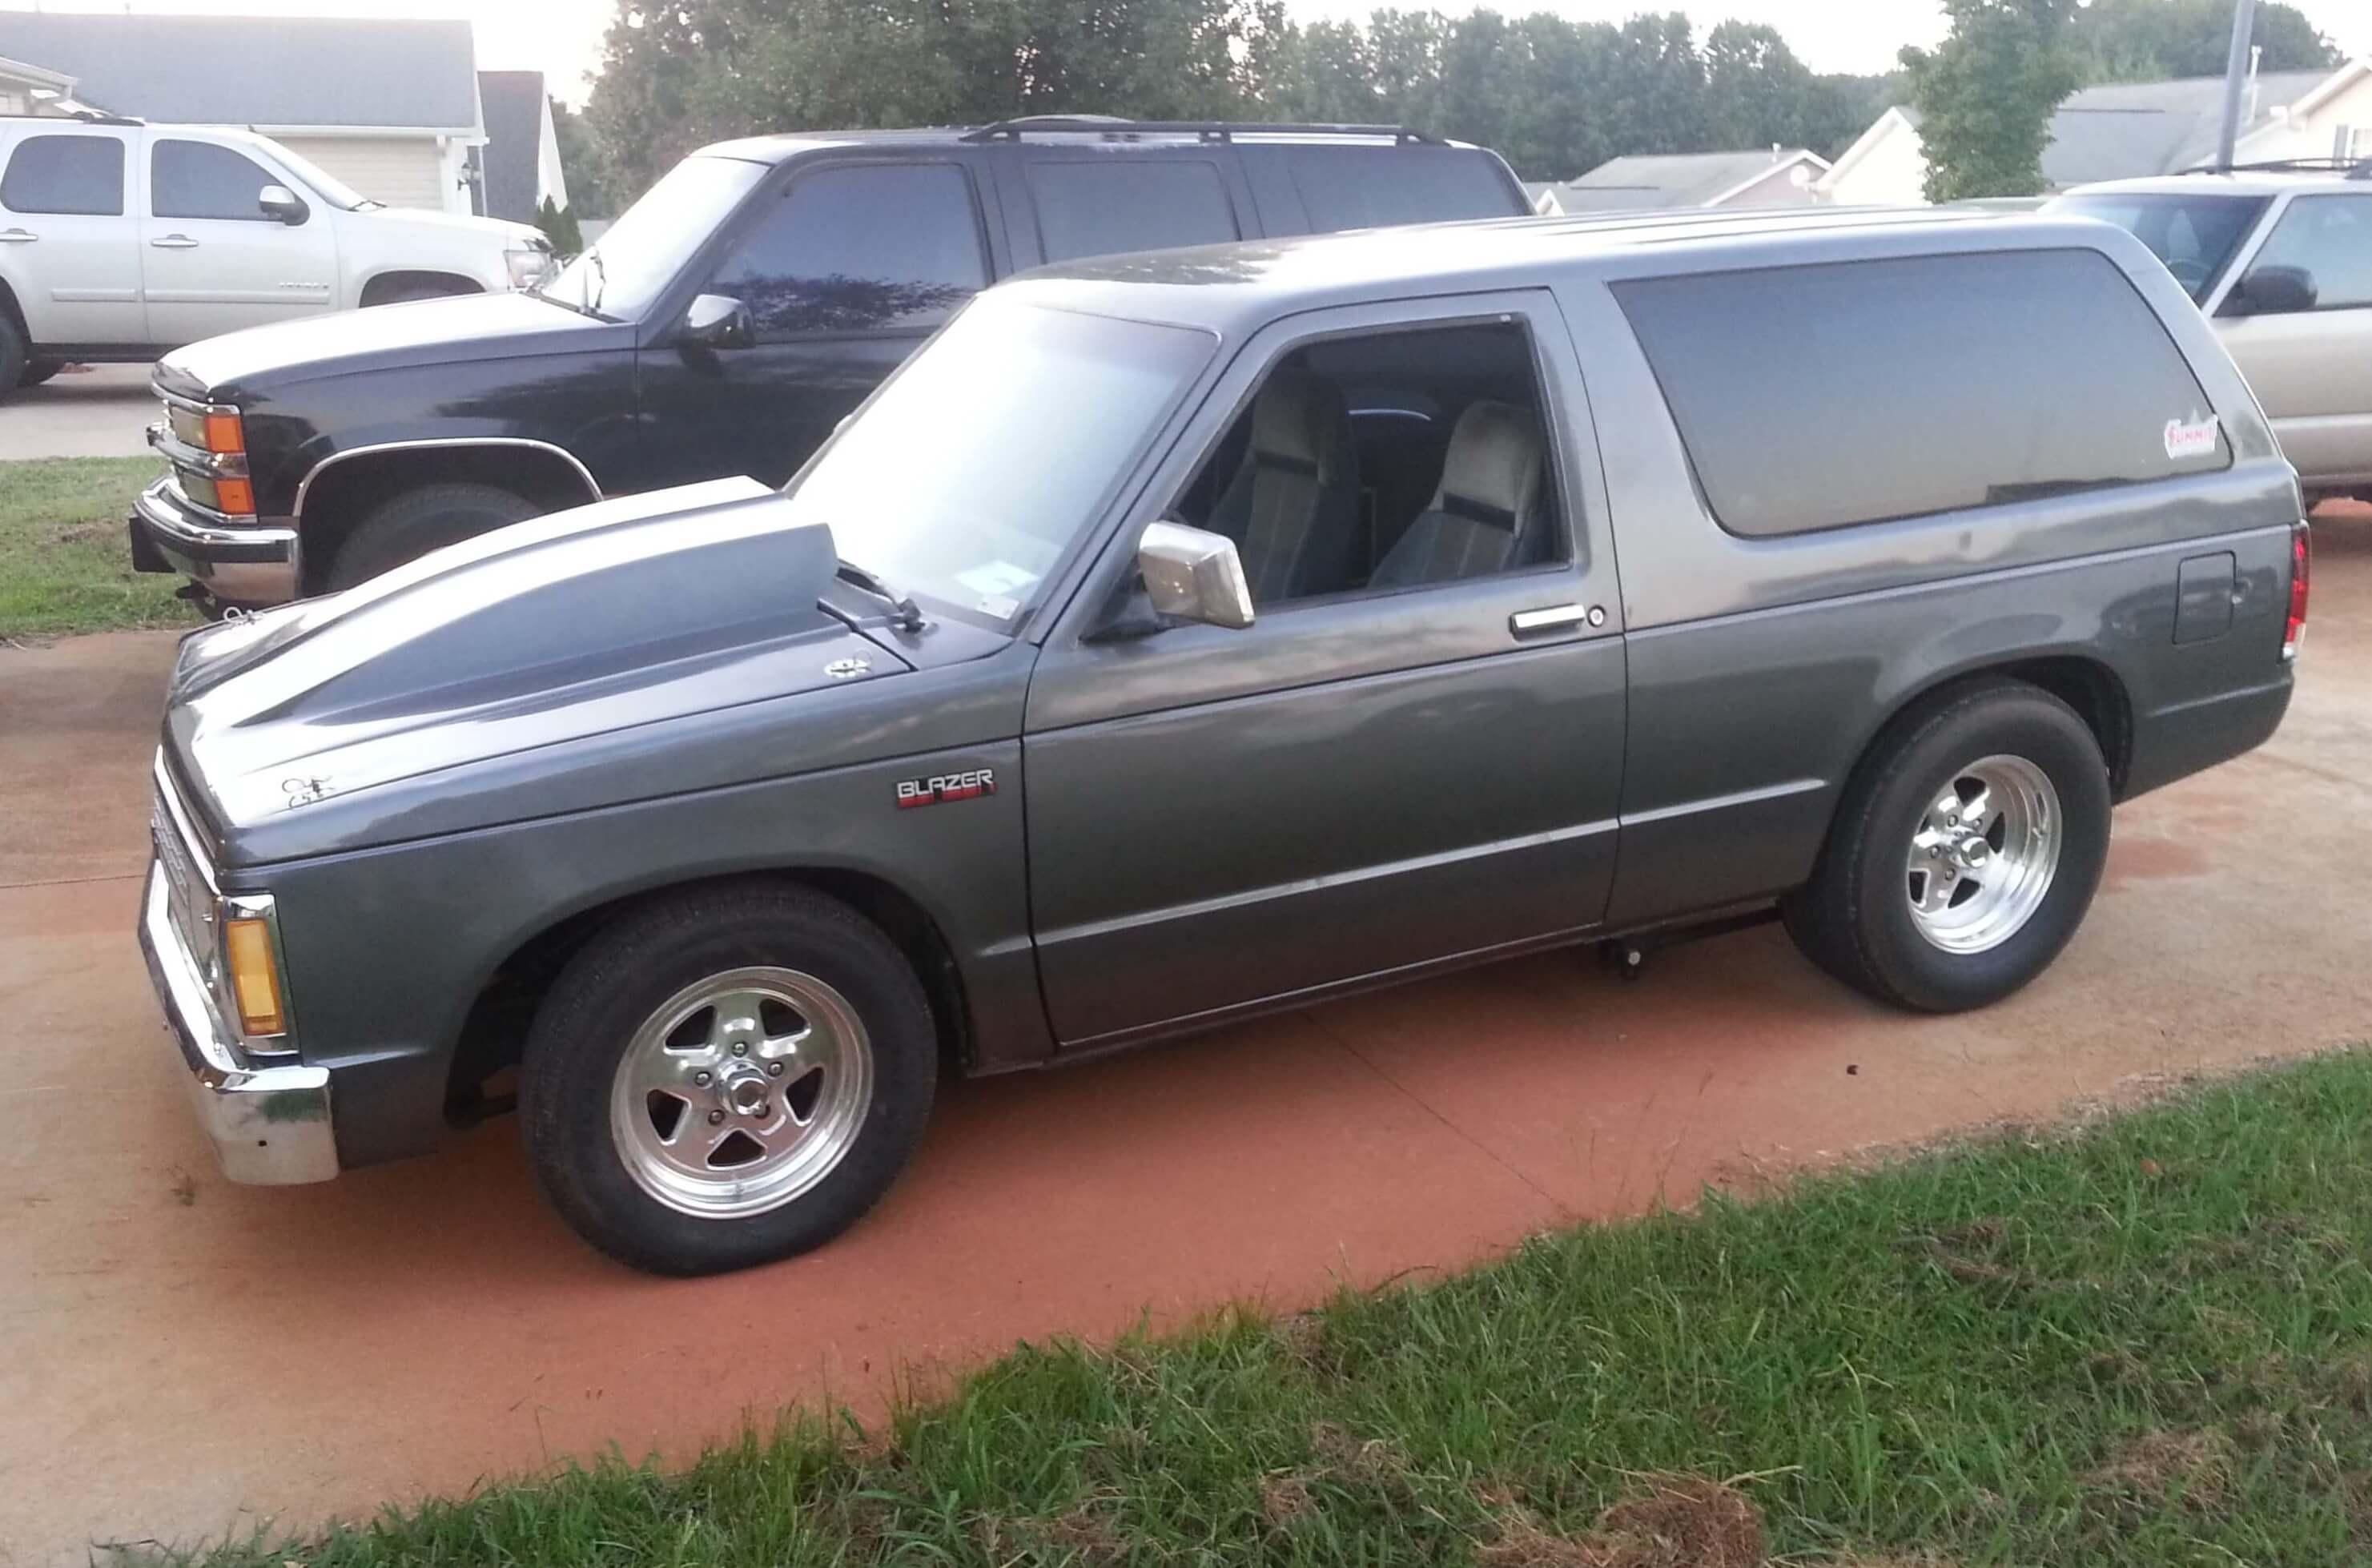 Michael's 1985 Chevrolet S10 Blazer - Holley My Garage